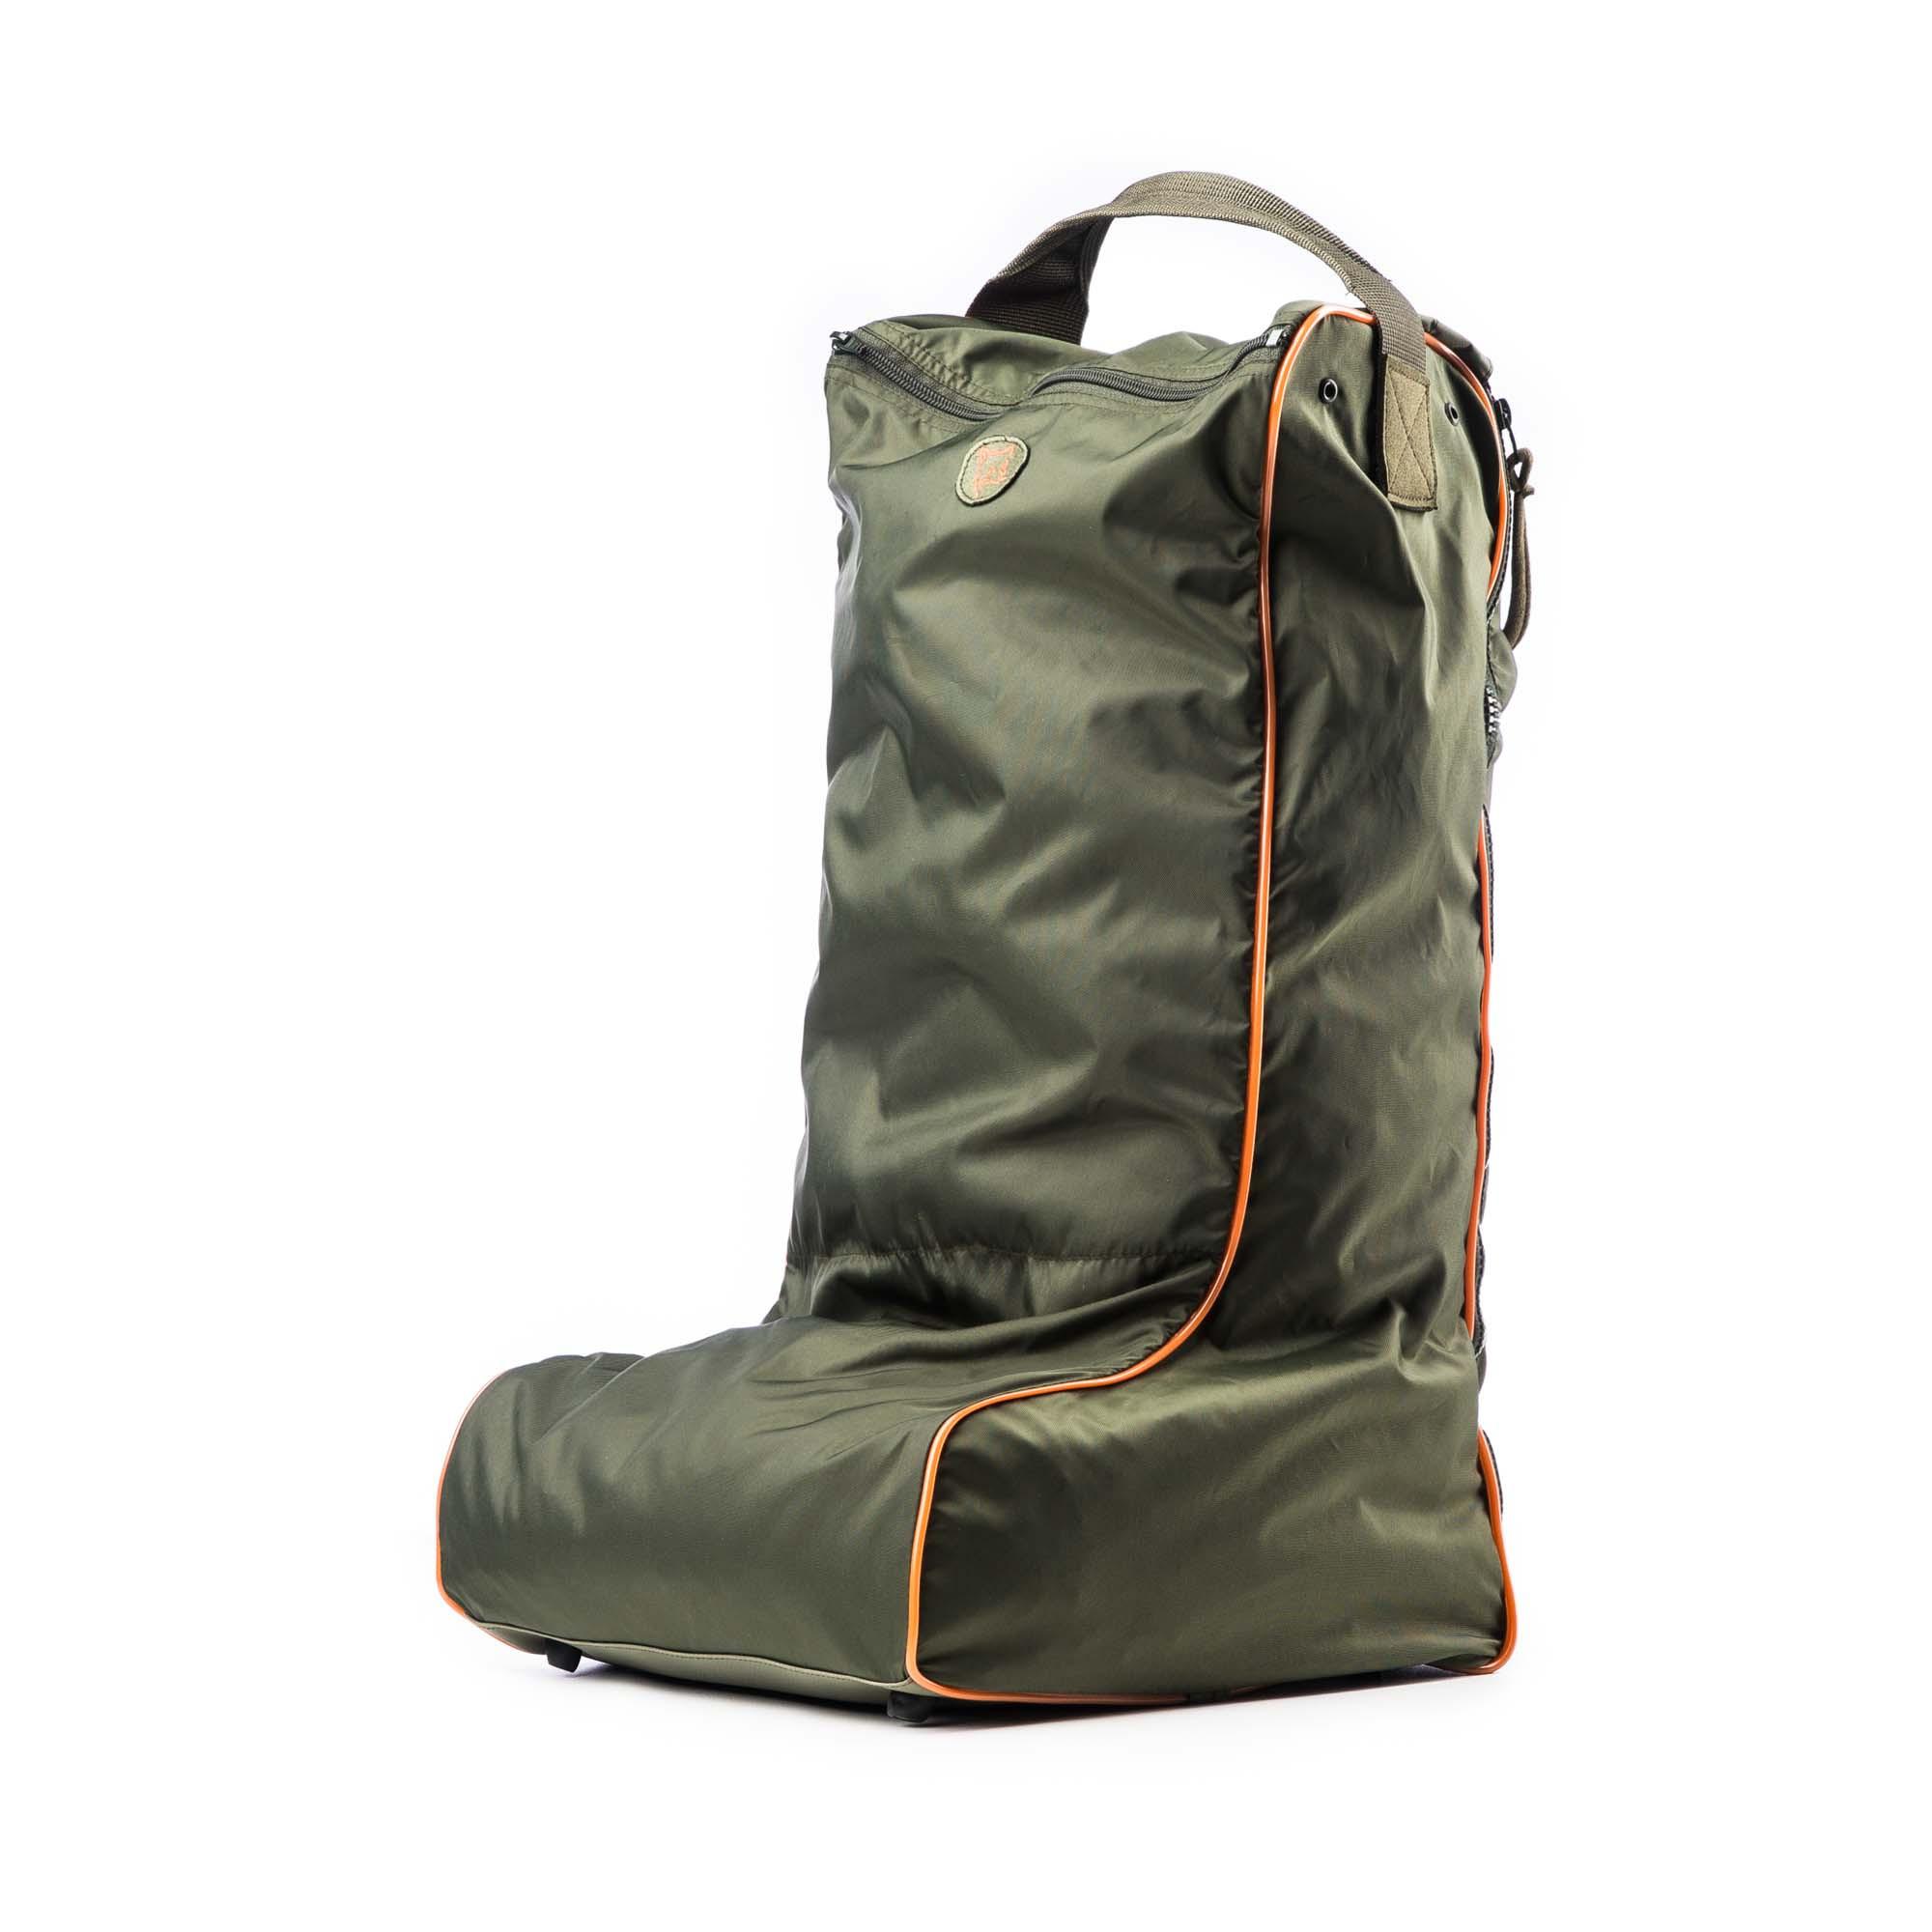 Field Boot Bag